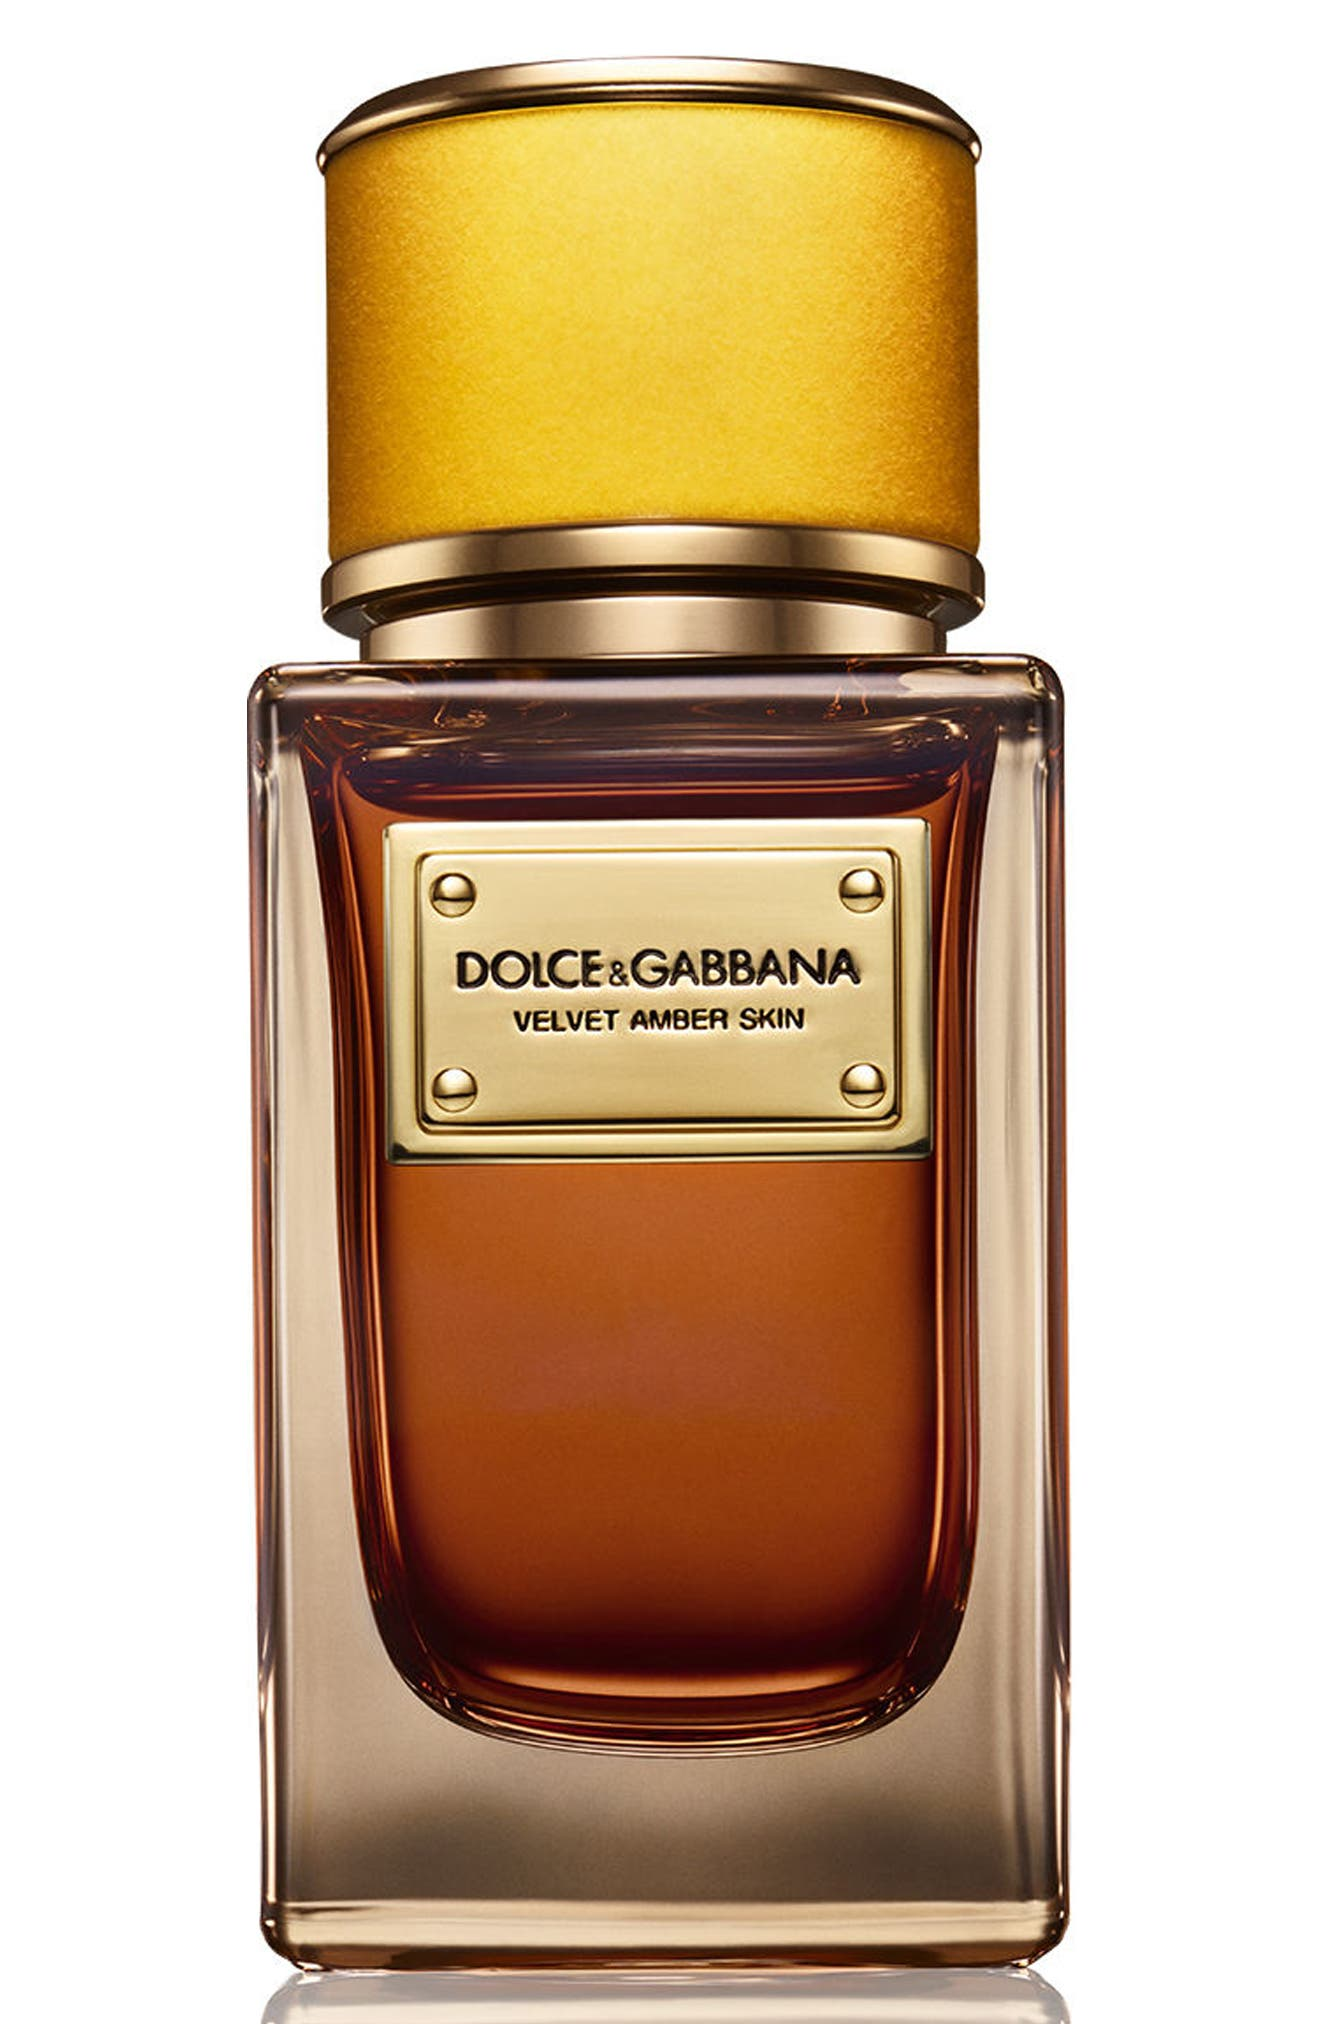 Dolce&Gabbana Velvet Amber Skin Eau de Parfum